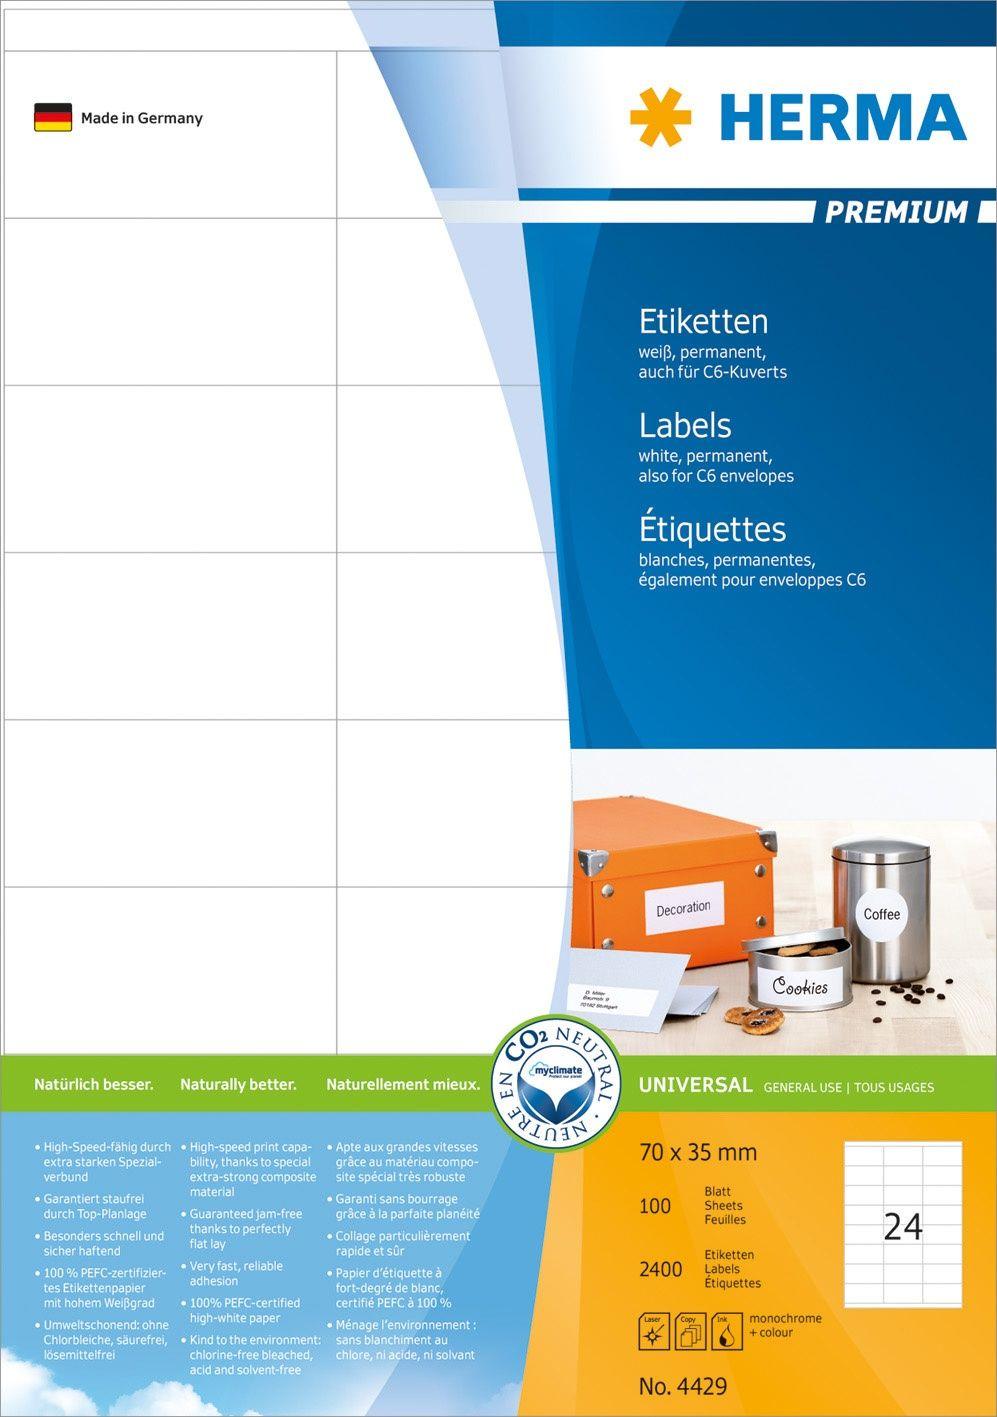 Herma Etikett premium A4 70x35mm (2400) Y489781